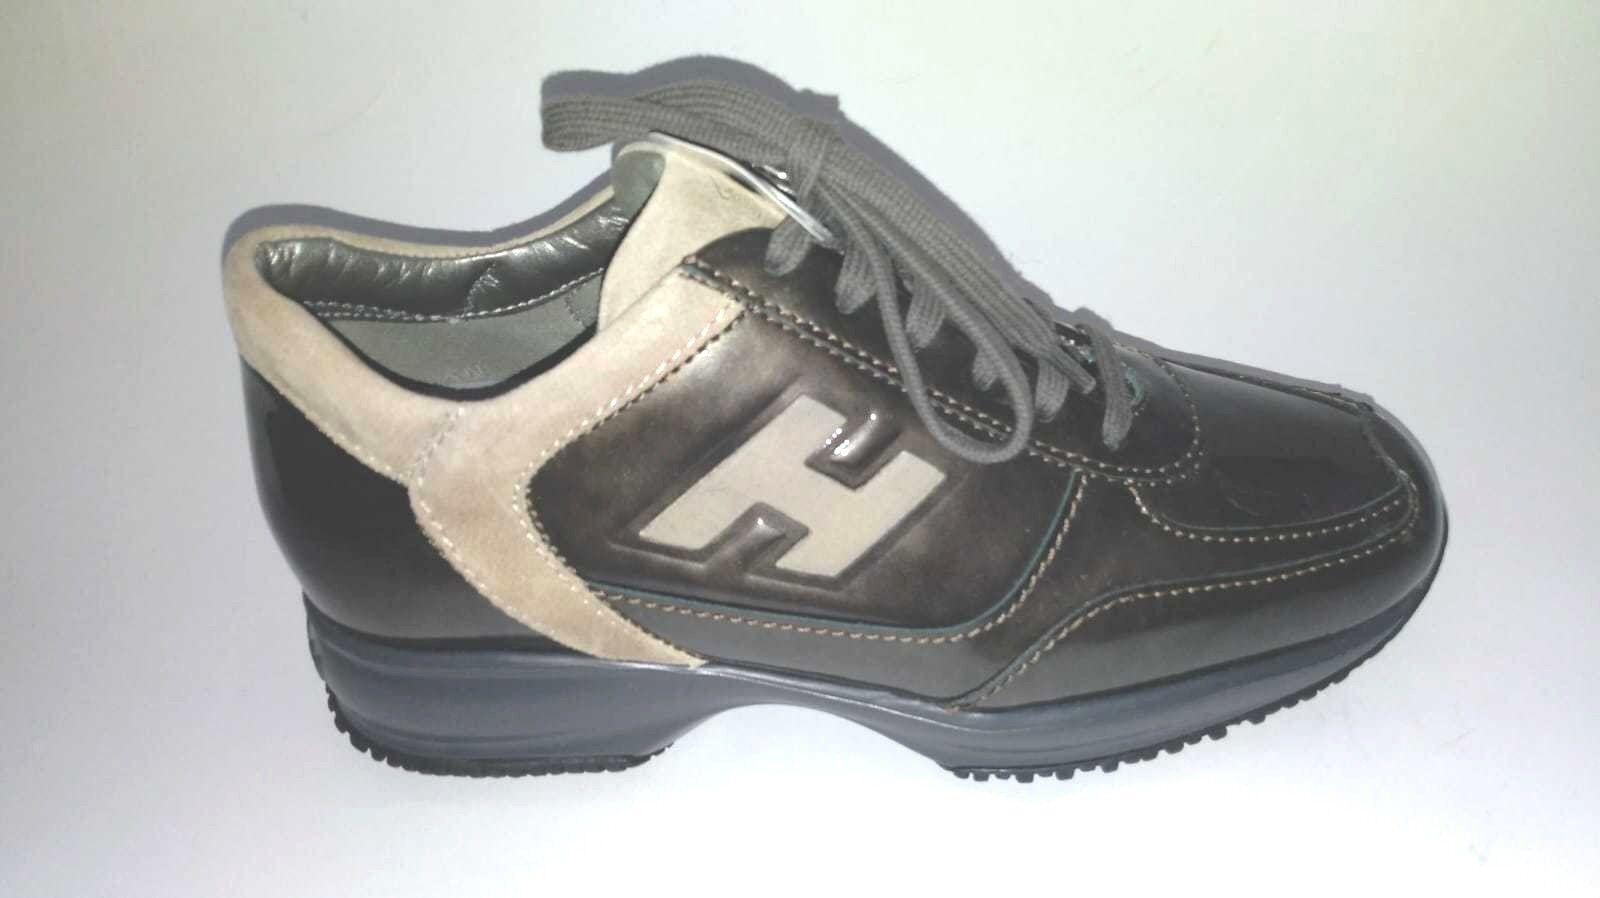 HOGAN INTERACTIF baskets chaussures n. 351 2 femme